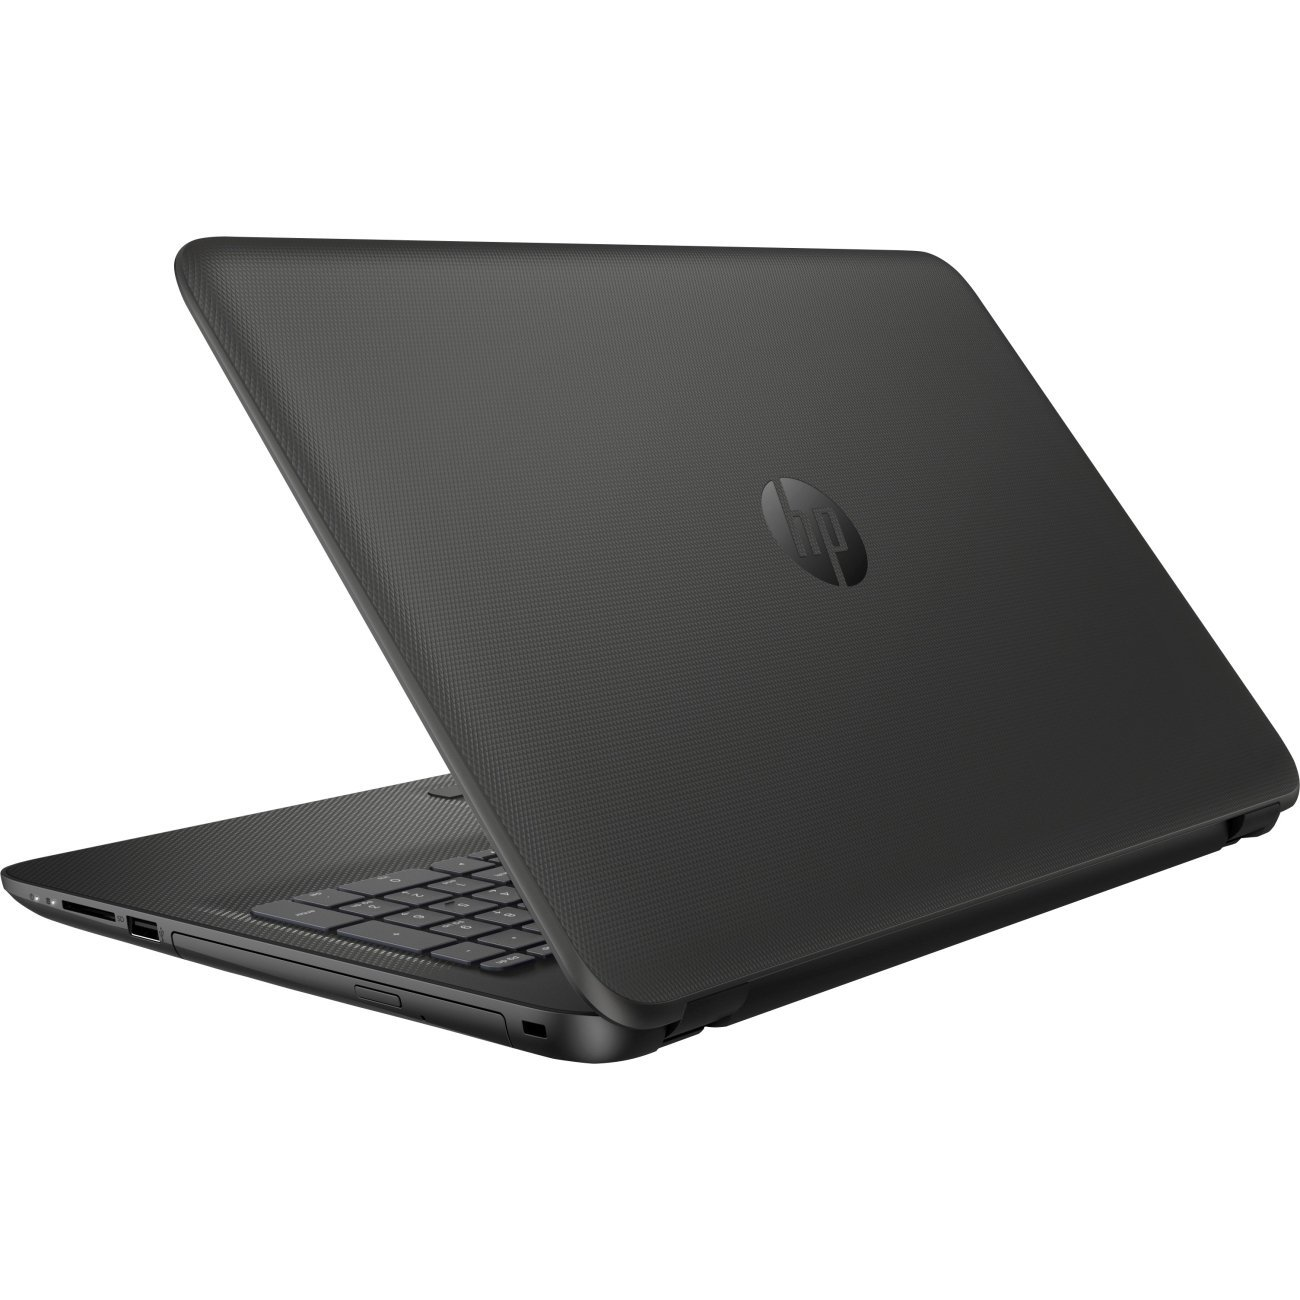 HP 15 BA079DX 156 Touch Laptop AMD A10 9600P 24GHz 6GB